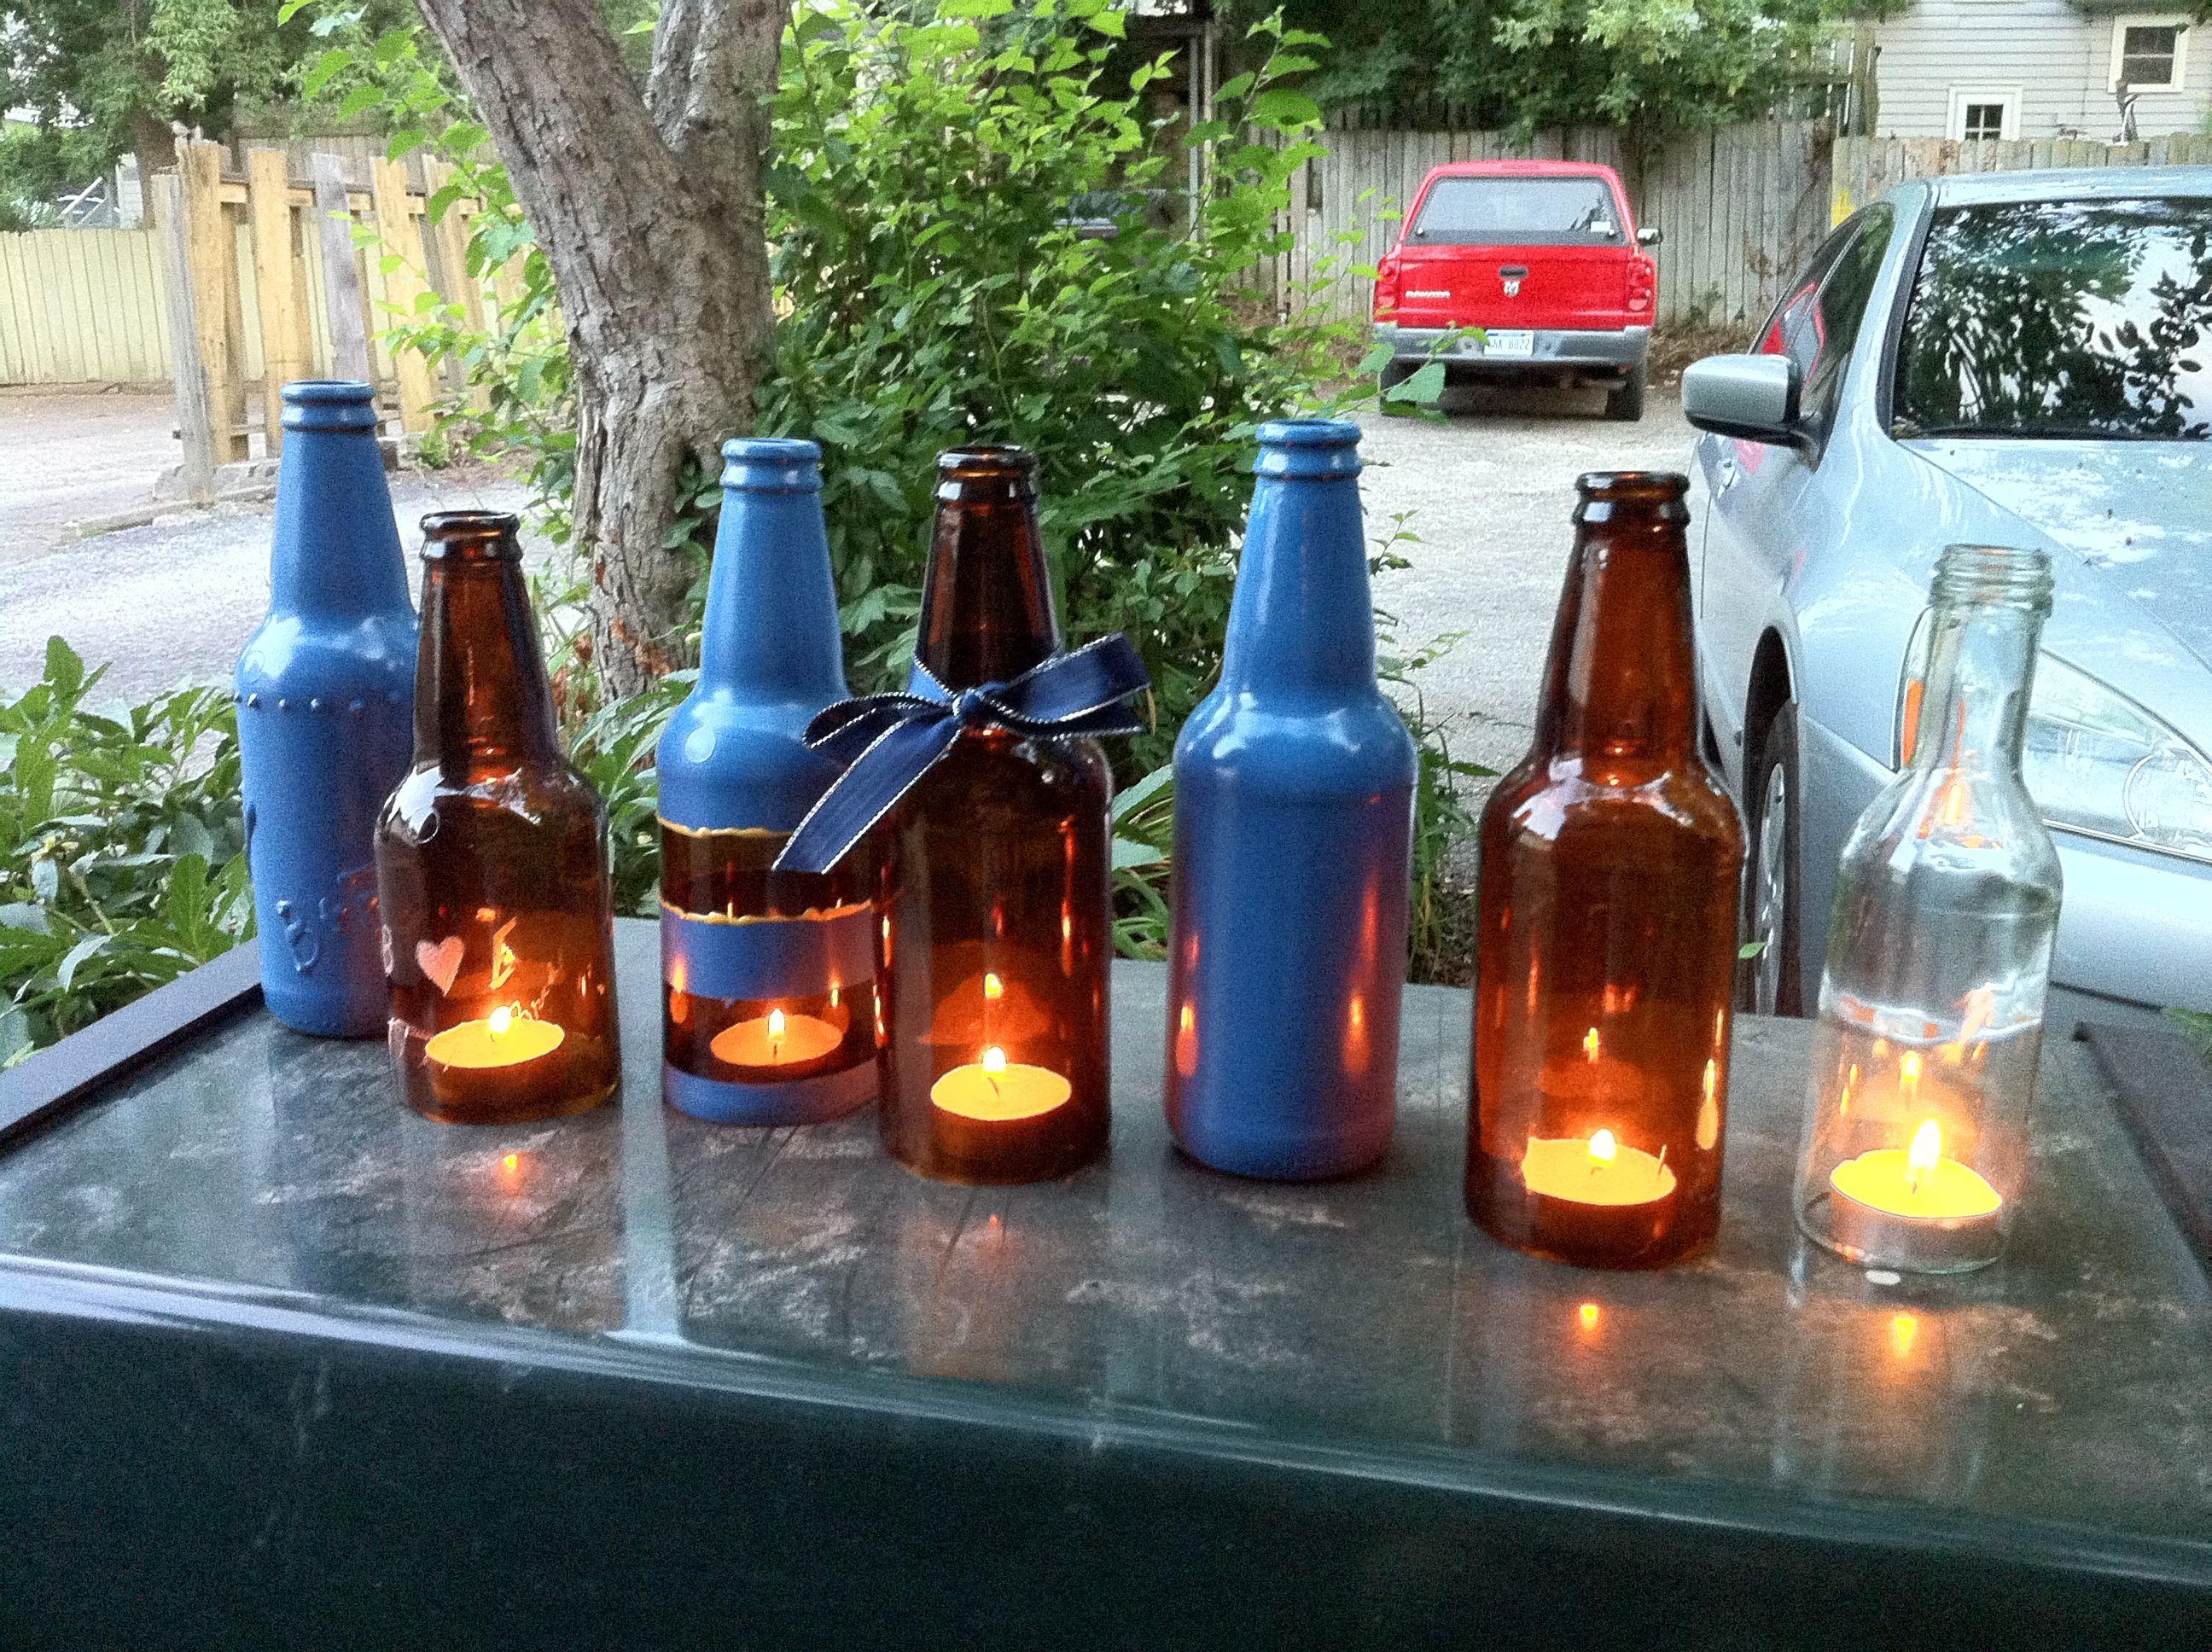 Beer Bottle Decoration Beer Bottle Decoration Ideasprototypes Price Geiss Wedding